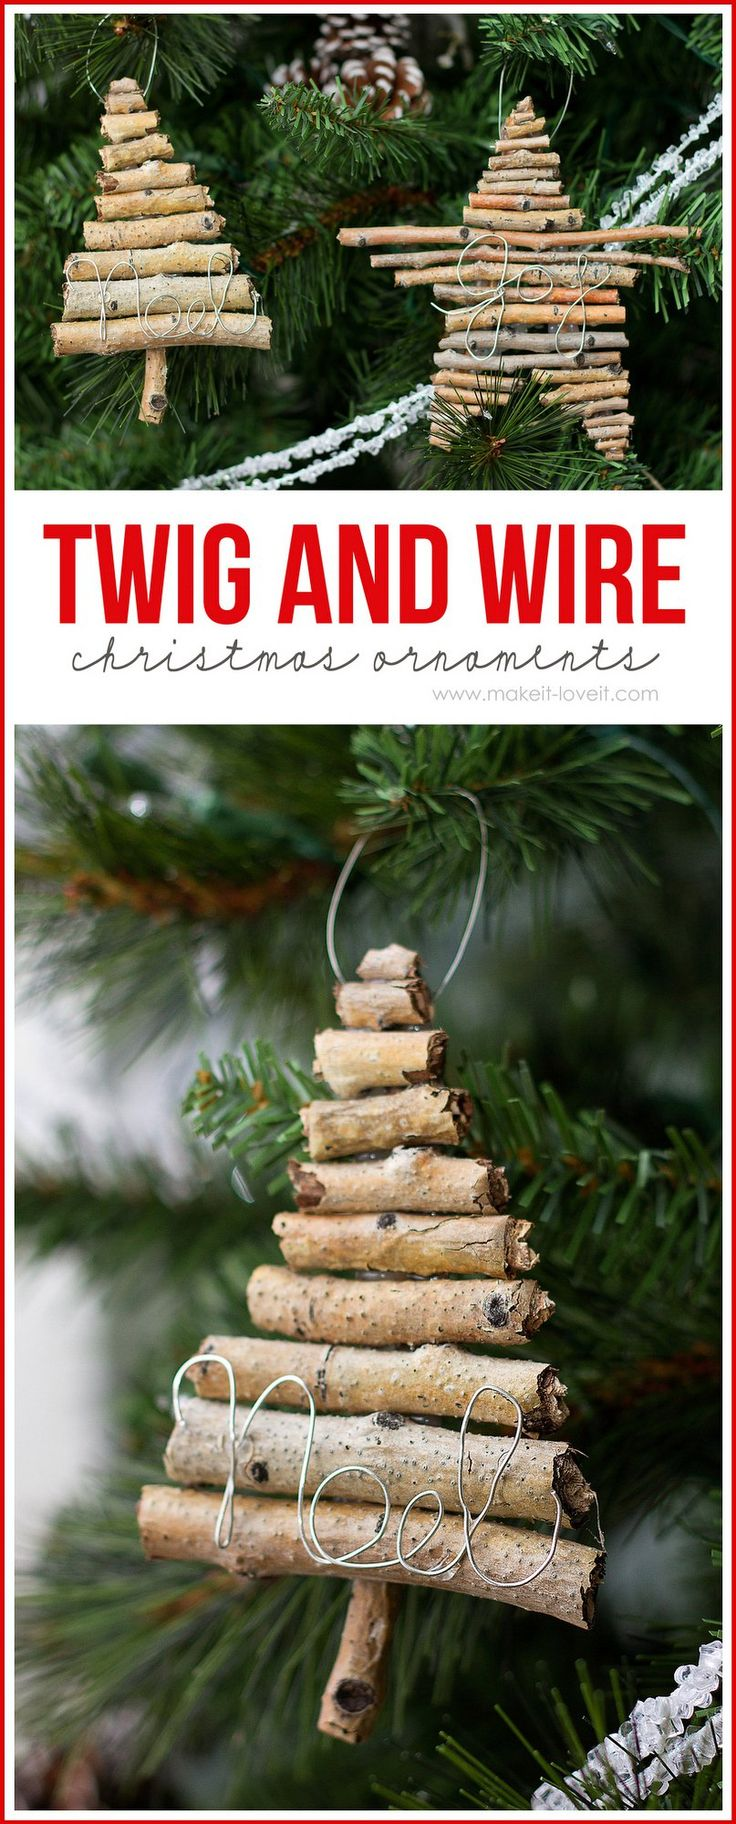 Best 25+ Seashell Christmas Ornaments Ideas On Pinterest  Seashell  Ornaments, Beach Christmas Ornaments And Beach Ornaments